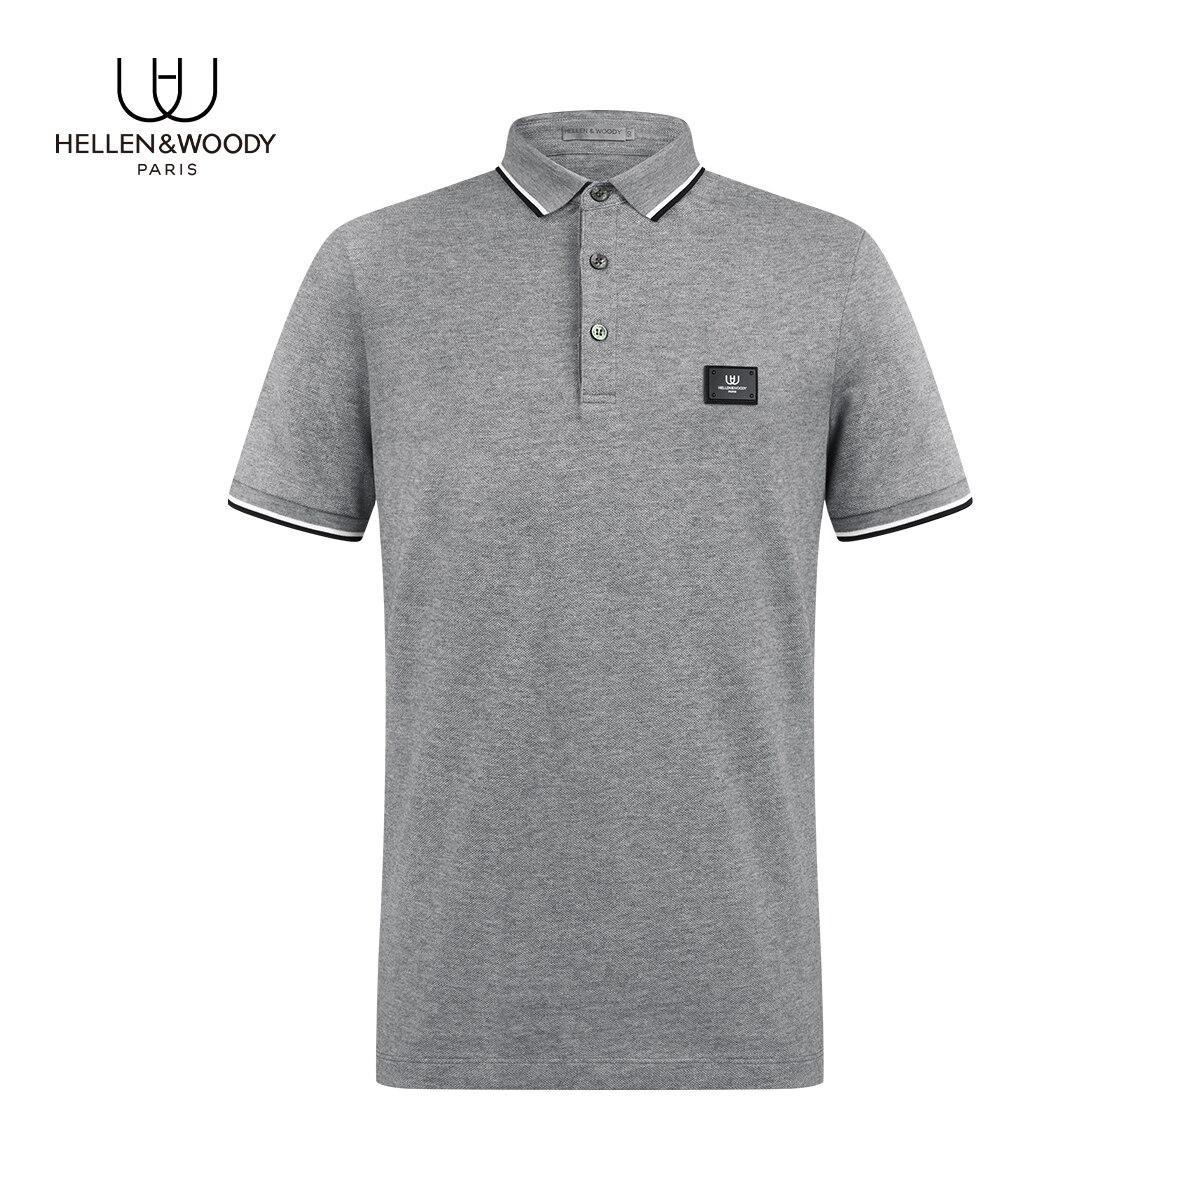 Hellen&Woody 2021 NEW Arrived MENS' Top Slim Fit Business Formal Wear Sheetmetal Brand LOGO Success Boyfriend Style T-Shirt Polo